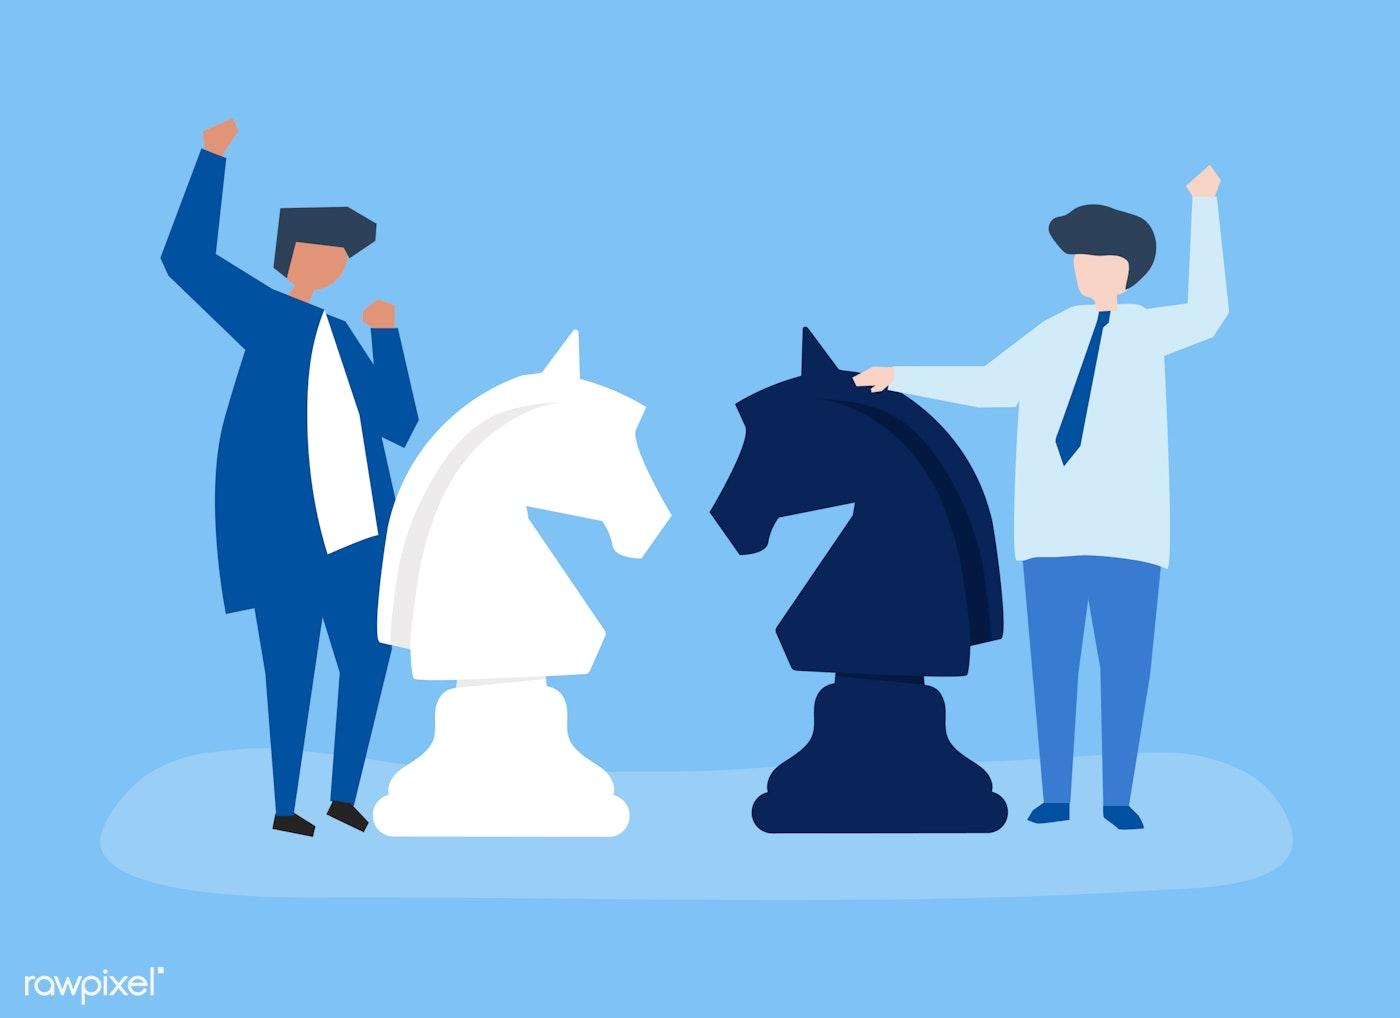 Knight horse chess piece icon | Free stock illustration - 457663